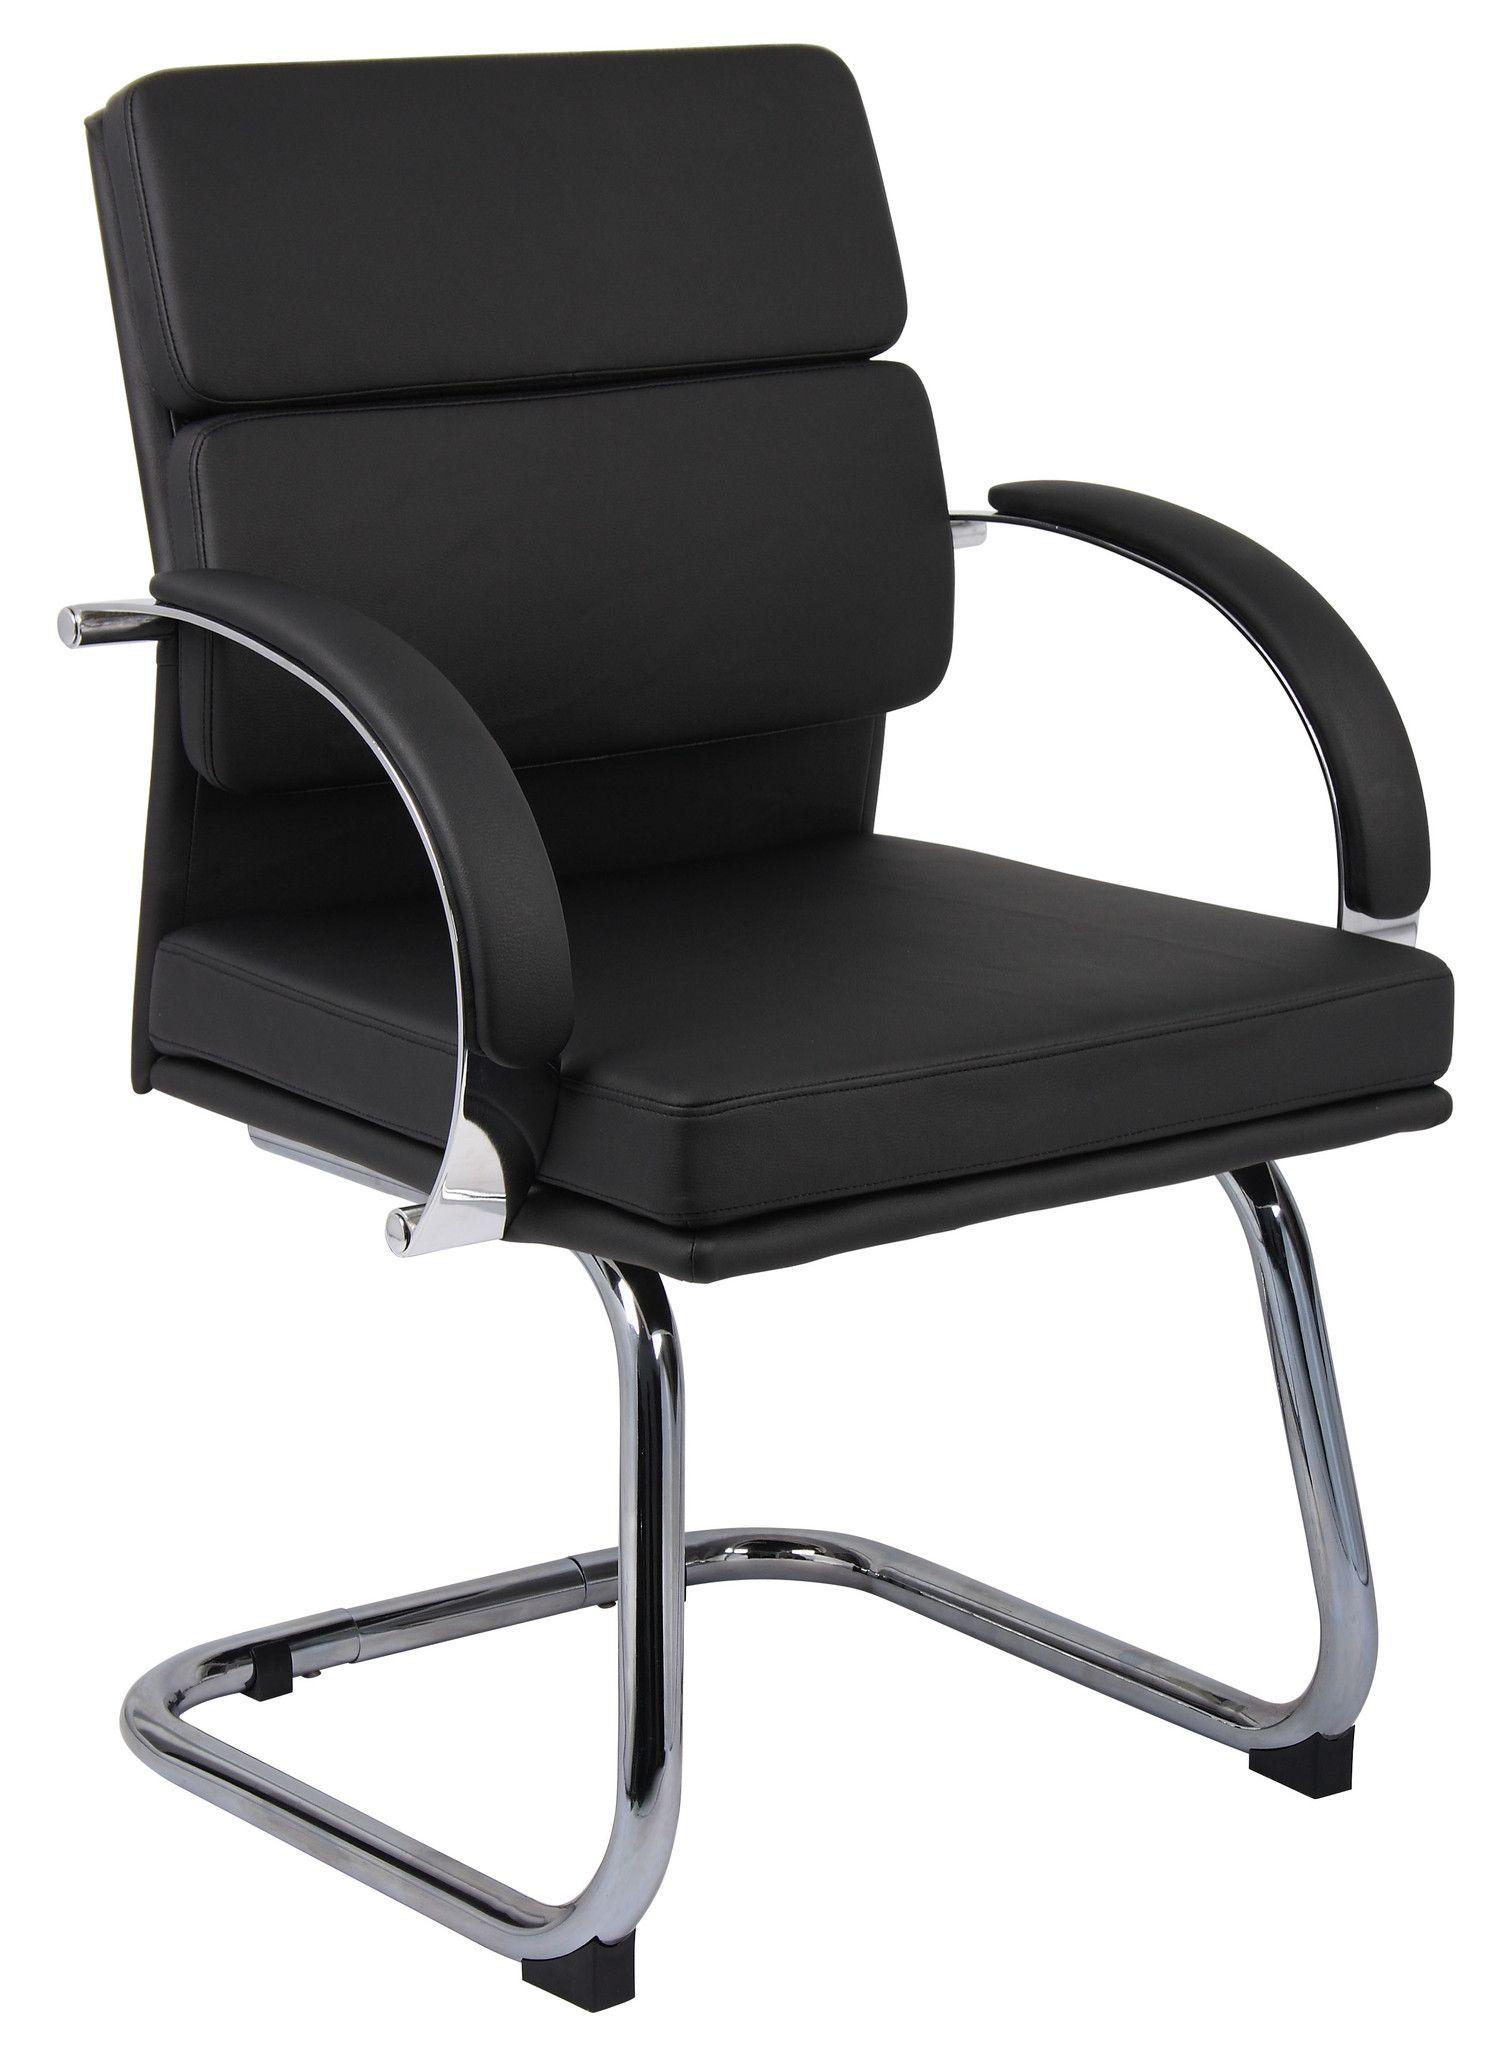 Boss B9409 Bk Caressoftplus Executive Series Chair Office Guest